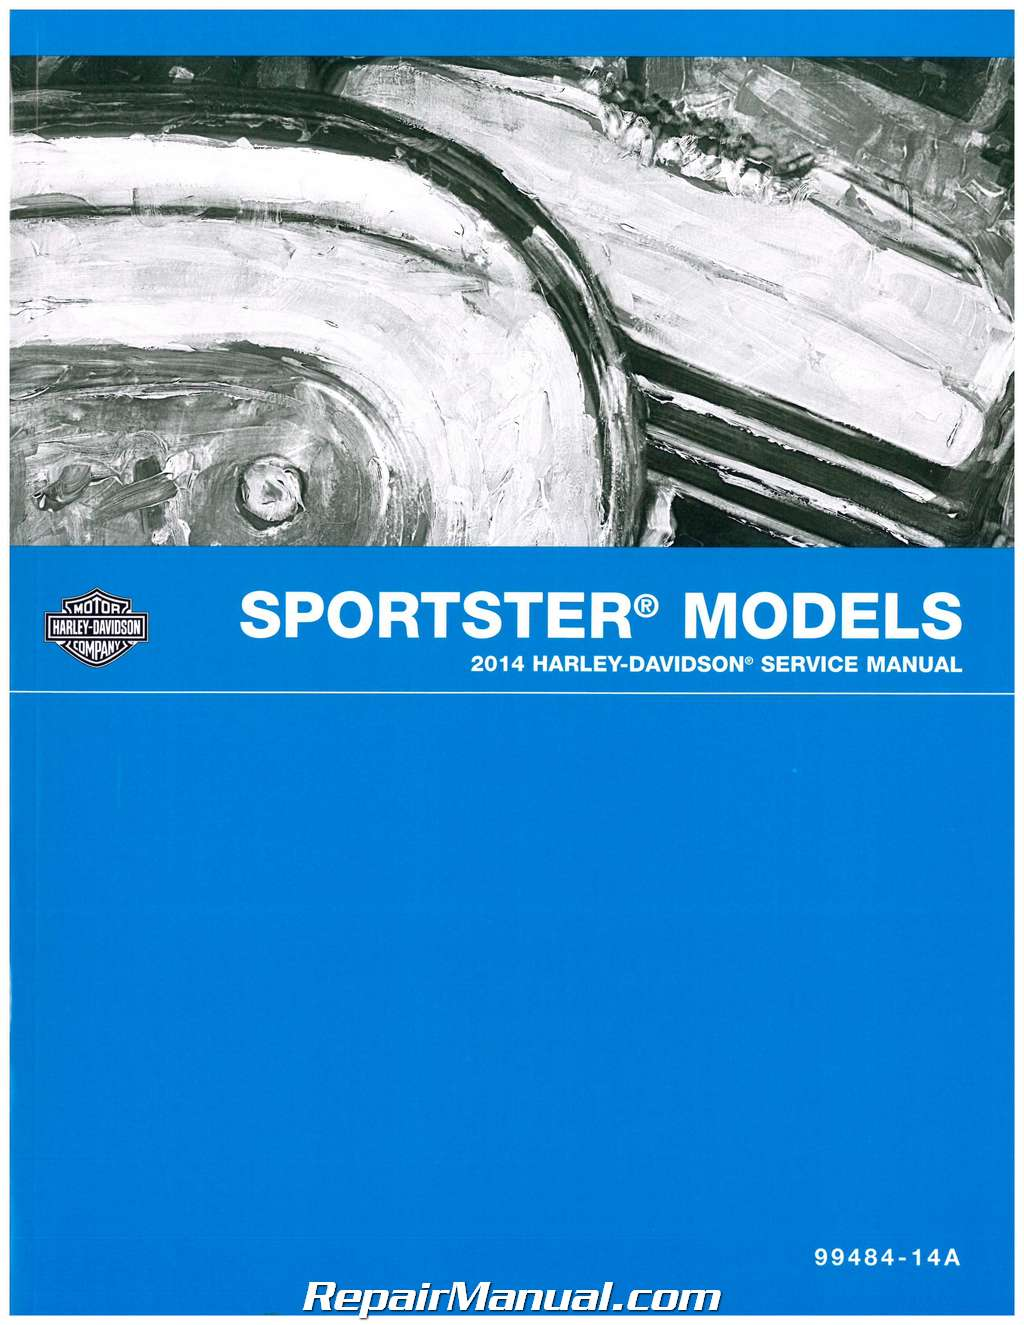 2014 harley davidson sportster motorcycle service manual rh repairmanual com 2012 sportster service manual 2014 sportster 883 service manual